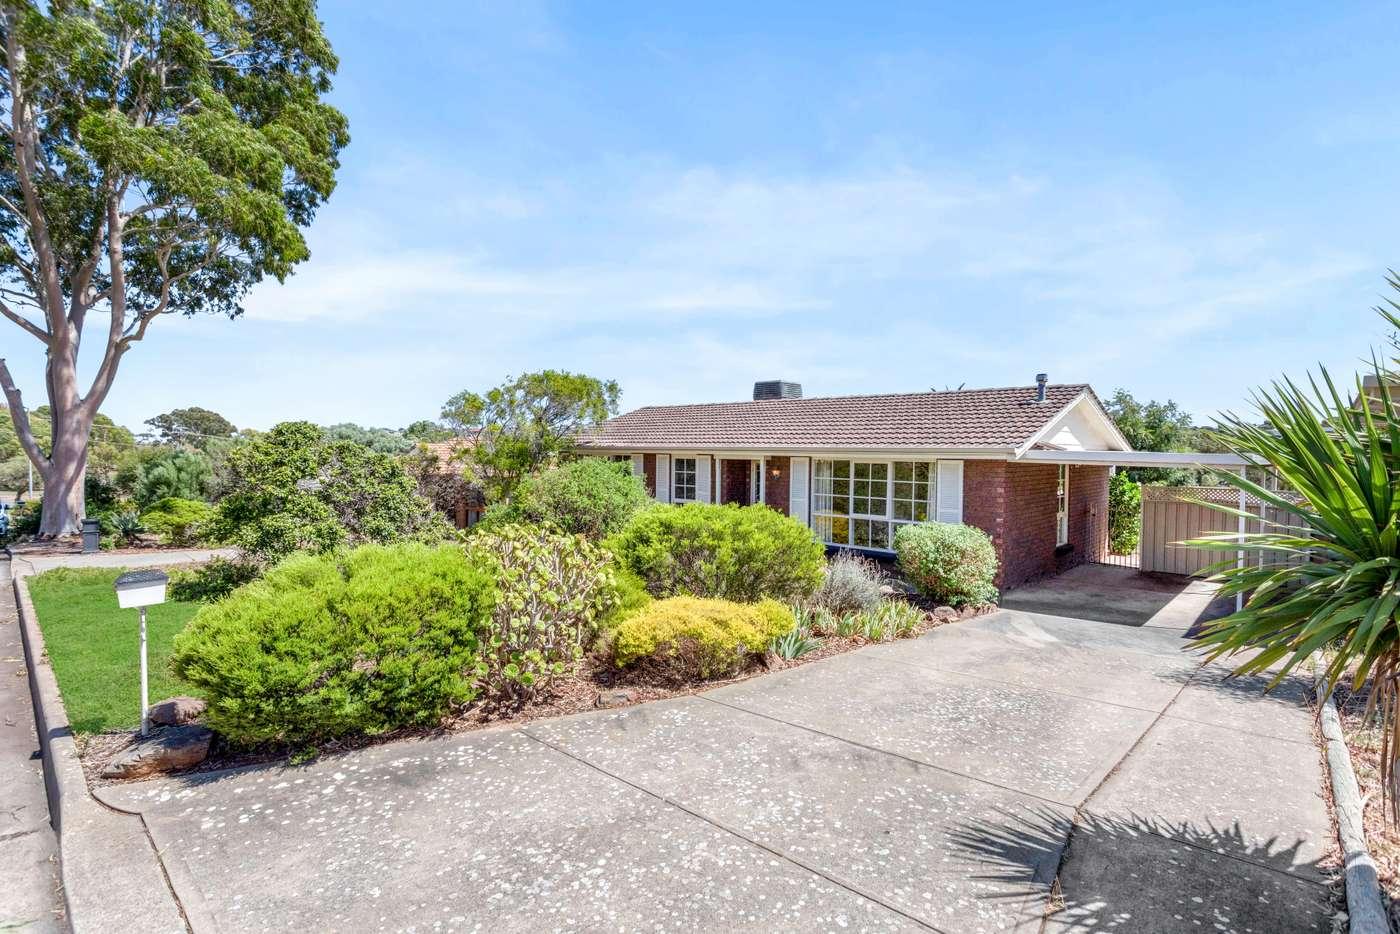 Main view of Homely house listing, 7 Angela Street, Reynella SA 5161